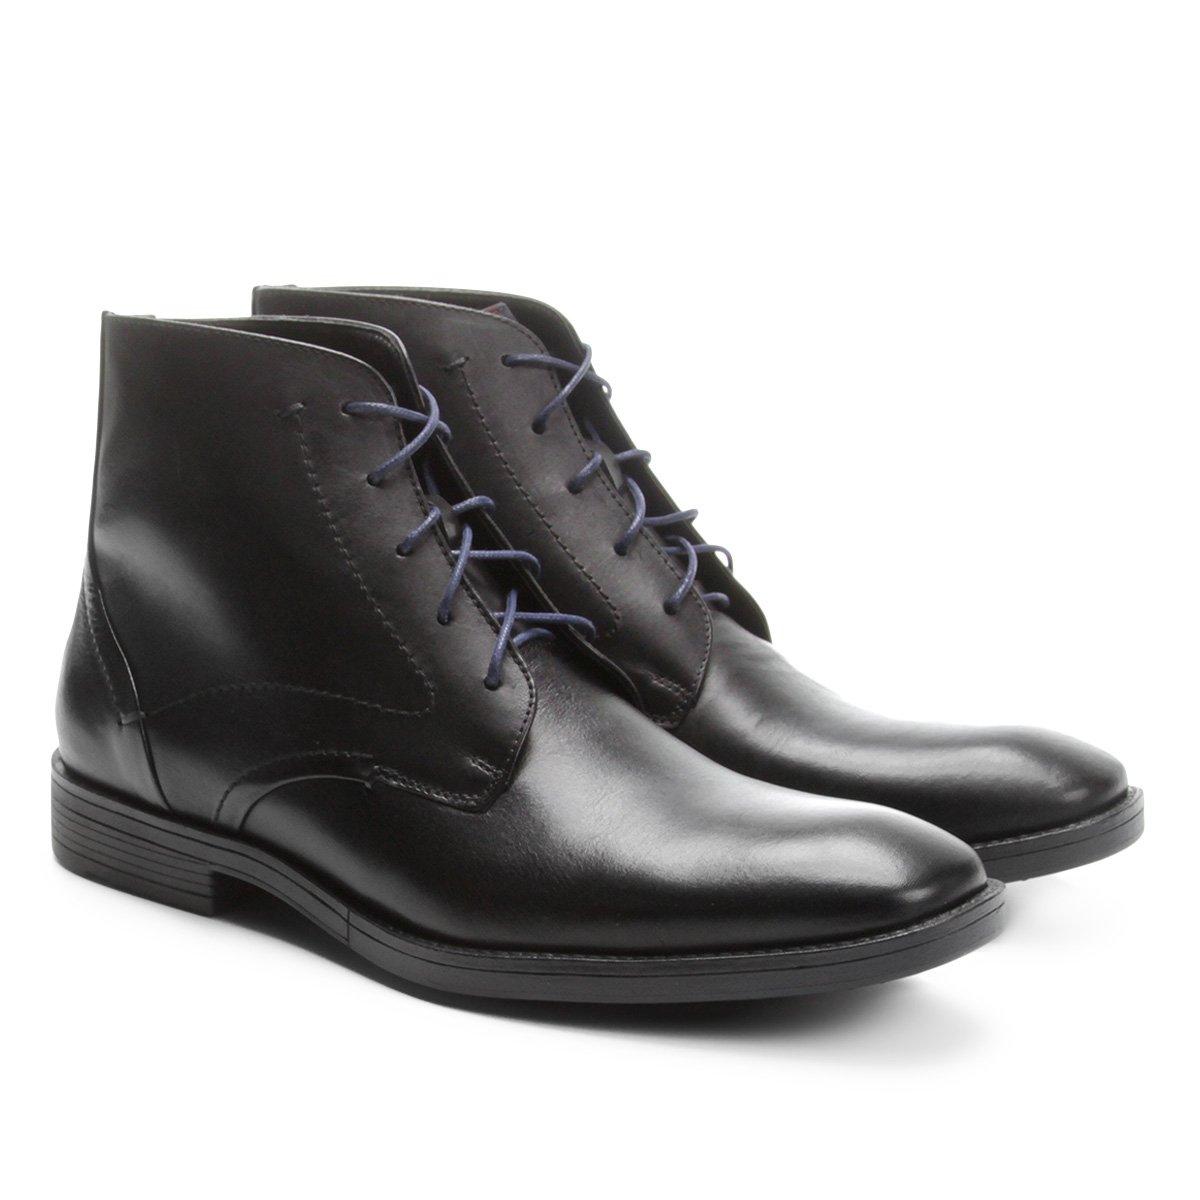 CANO Bota Shoestock Preto COURO Shoestock Bota MÉDIO qP4xPBgw